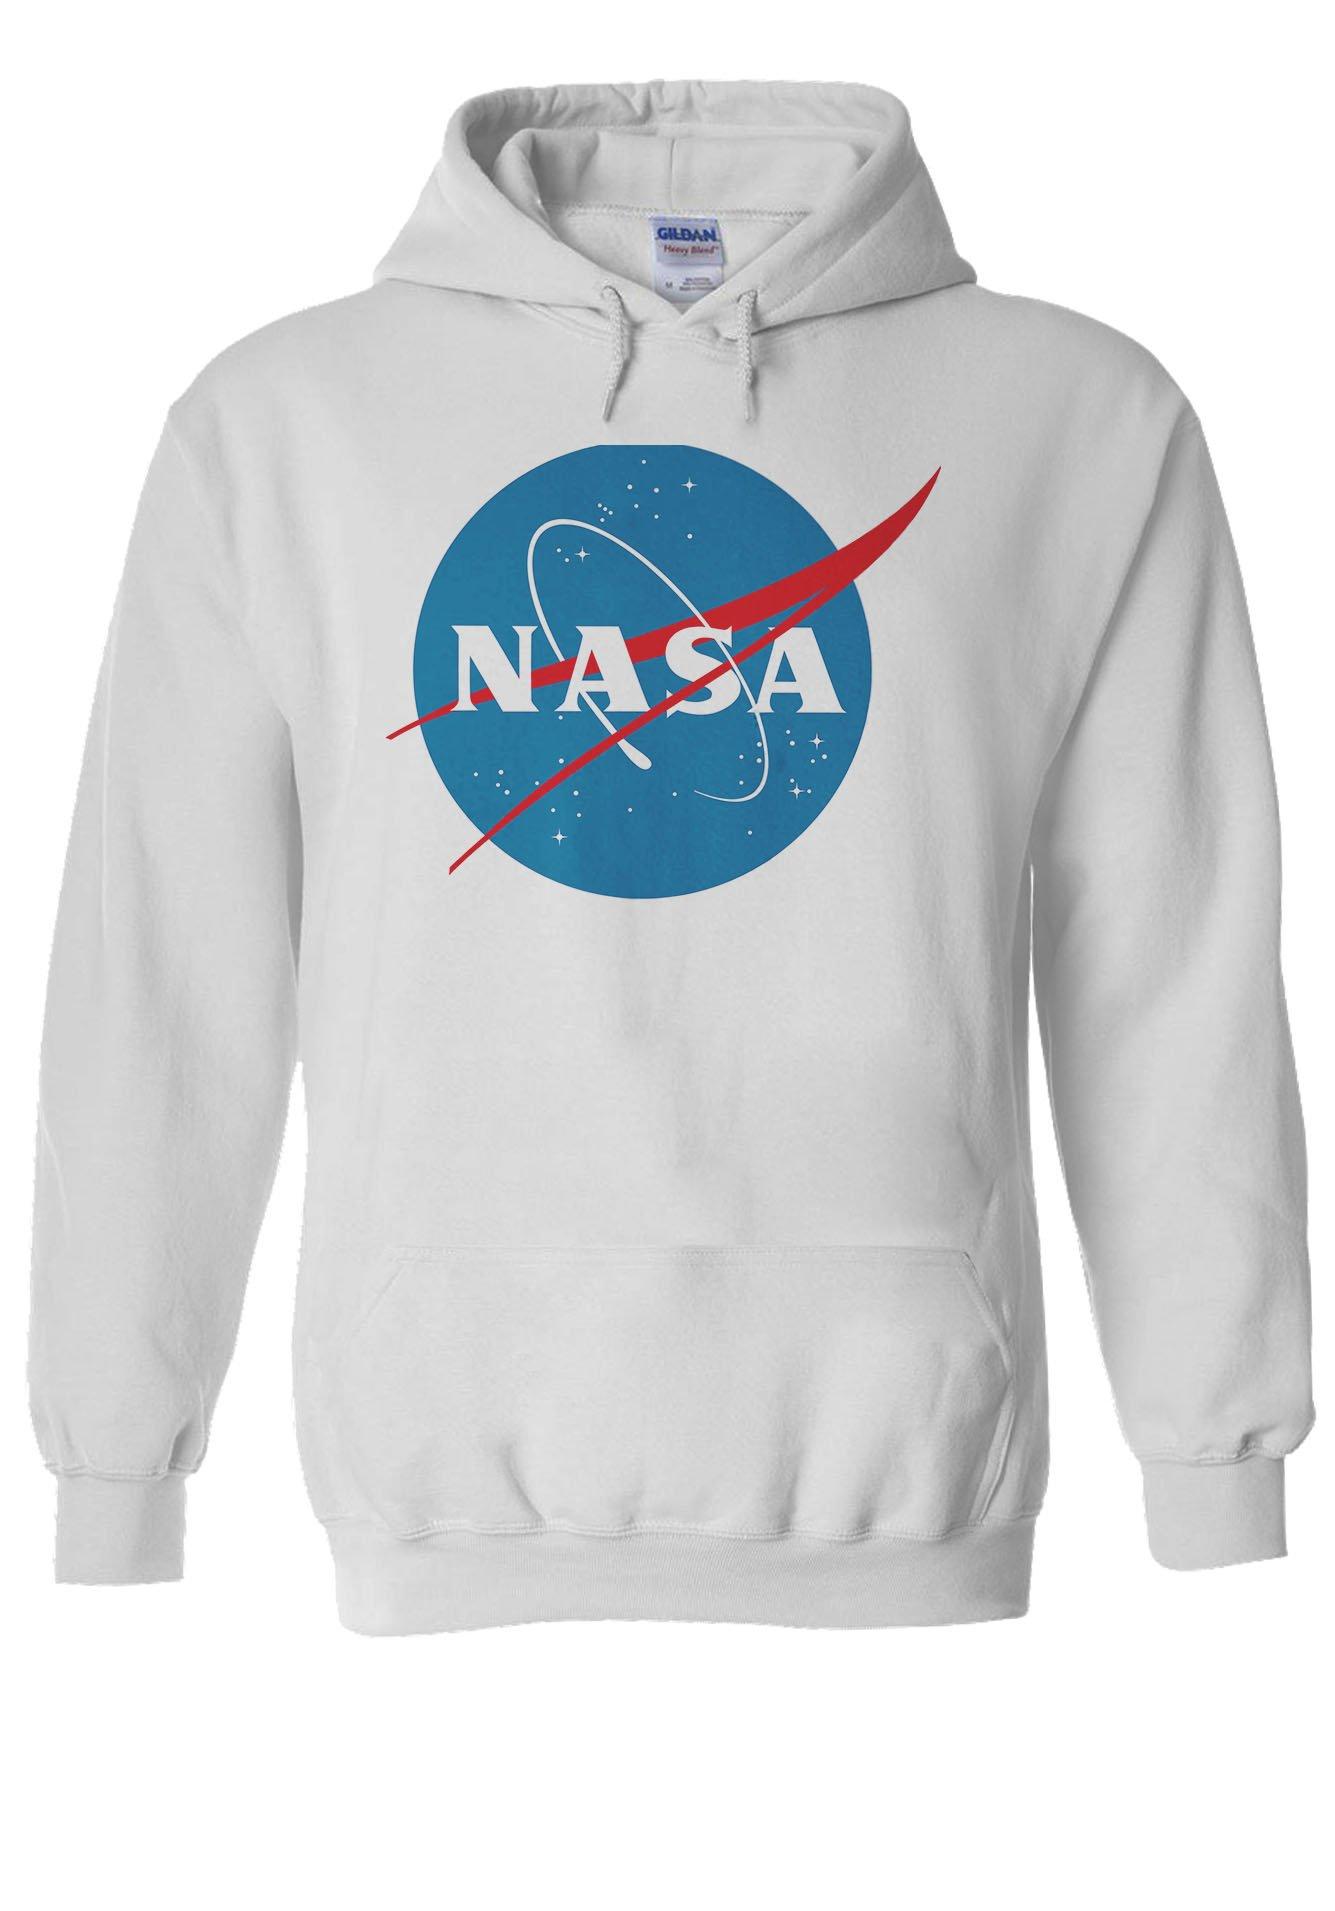 Nasa National Space Administration Logo White Men Women Unisex Hooded Sweatshirt Hoodie-M